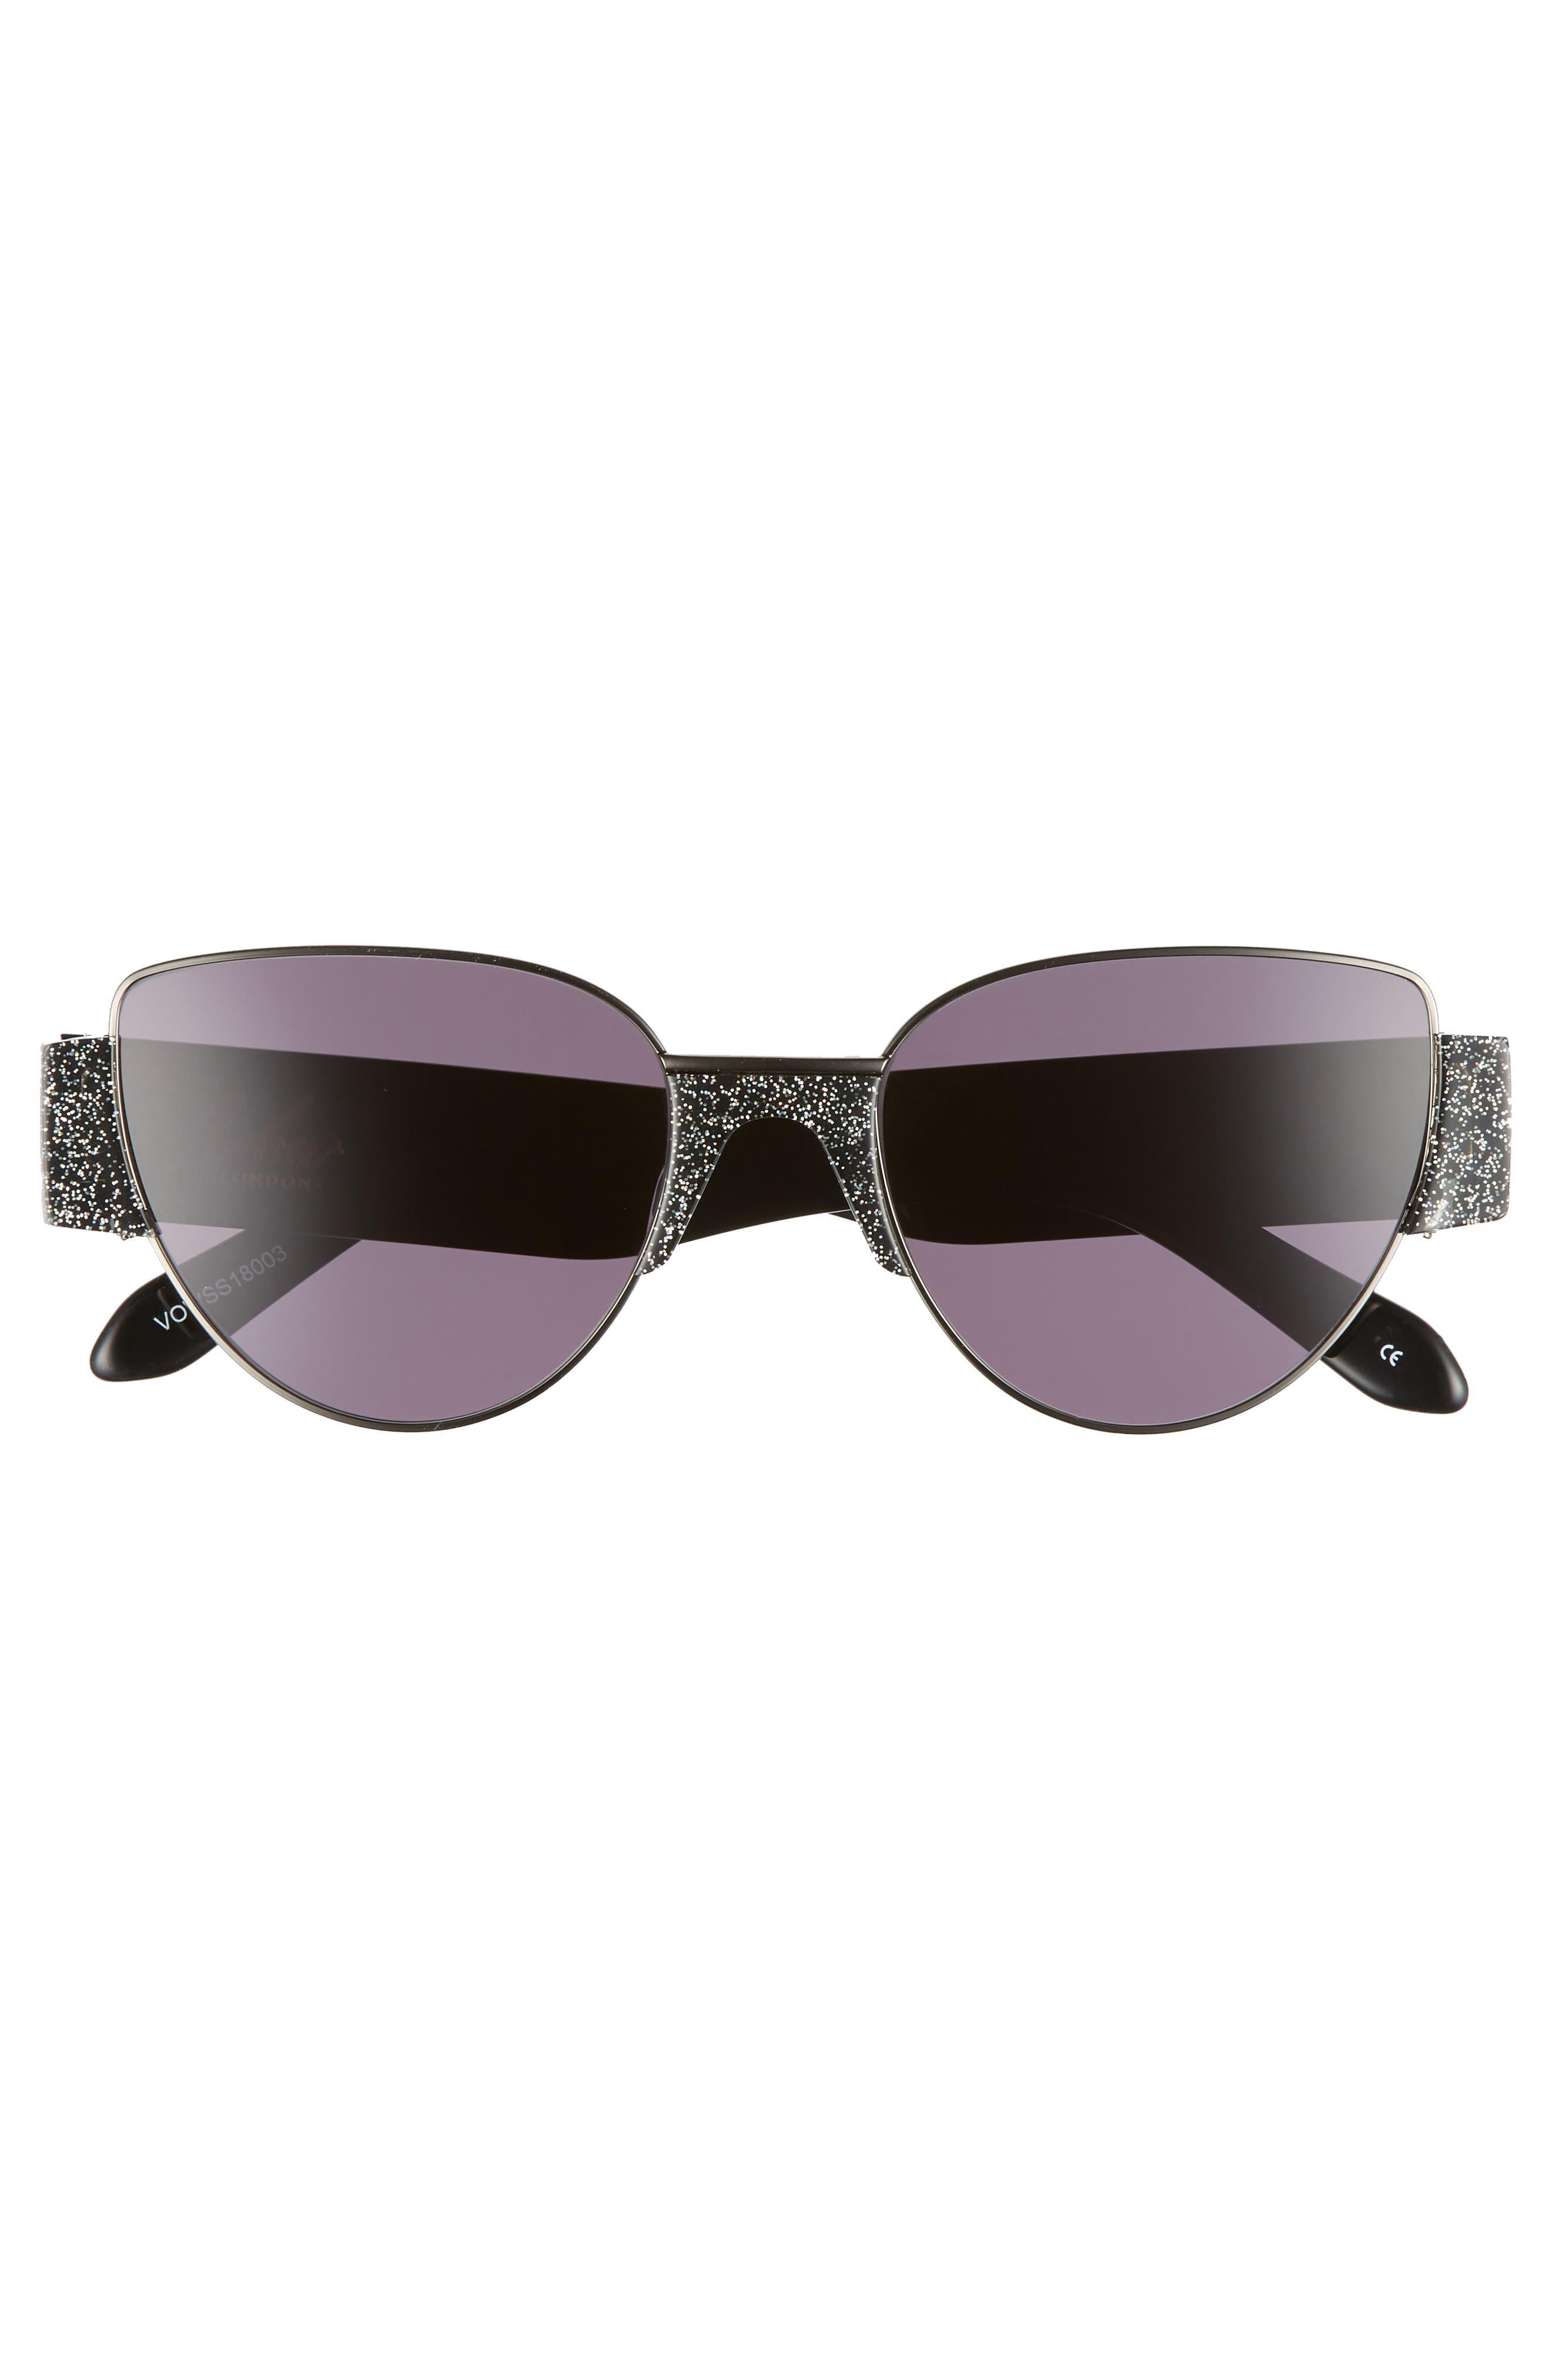 Dahlia 55mm Cat Eye Sunglasses,                             Alternate thumbnail 3, color,                             MULTI GLITTER/ GUNMETAL/ SMOKE